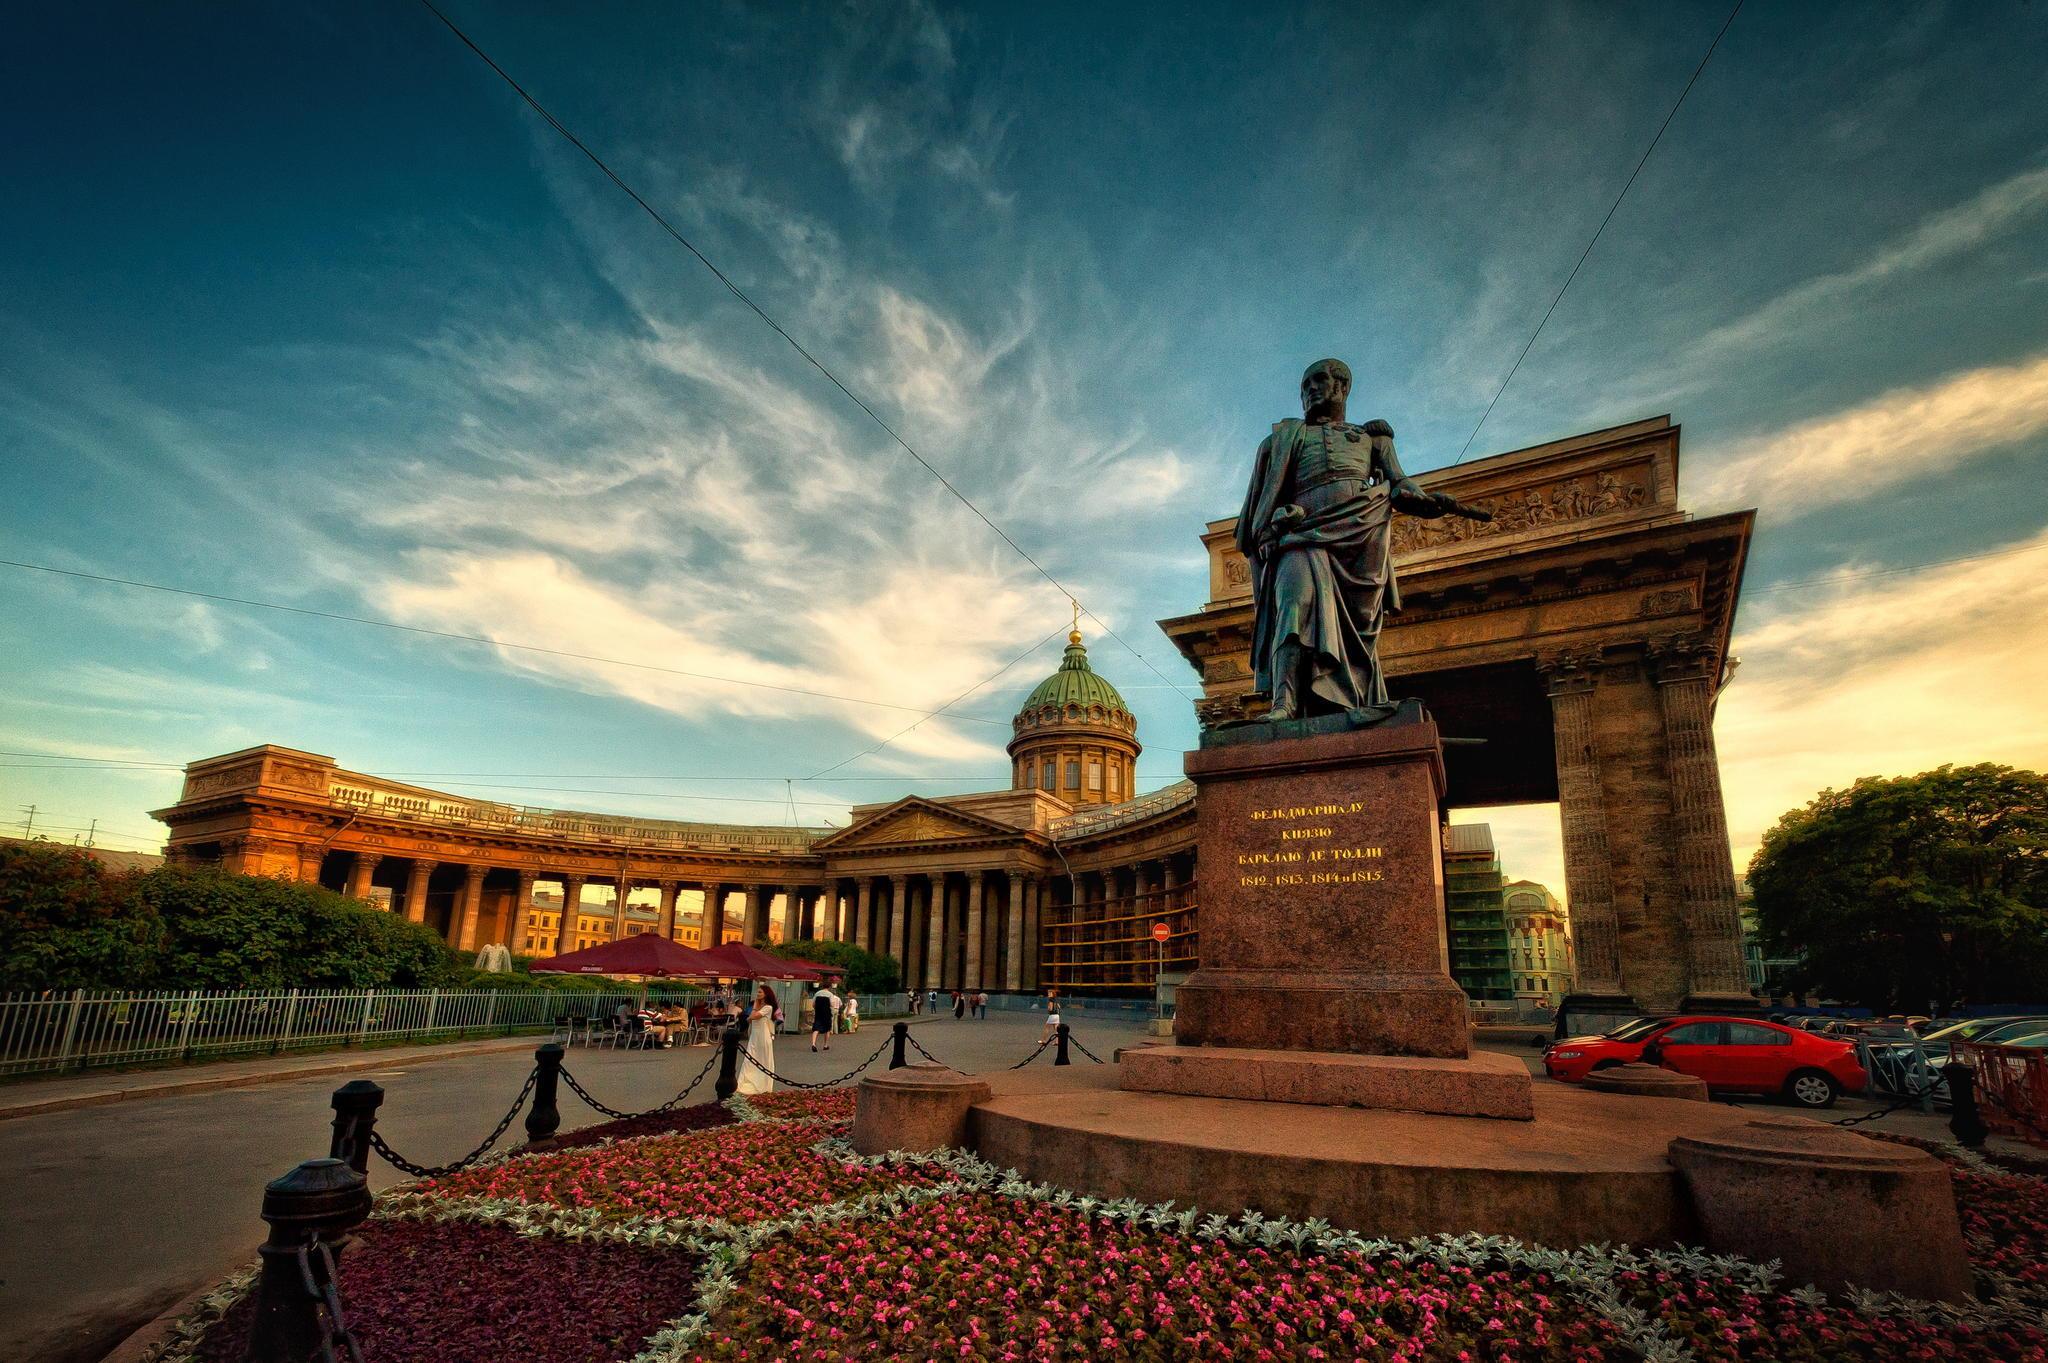 Man Made Saint Petersburg 2048x1363